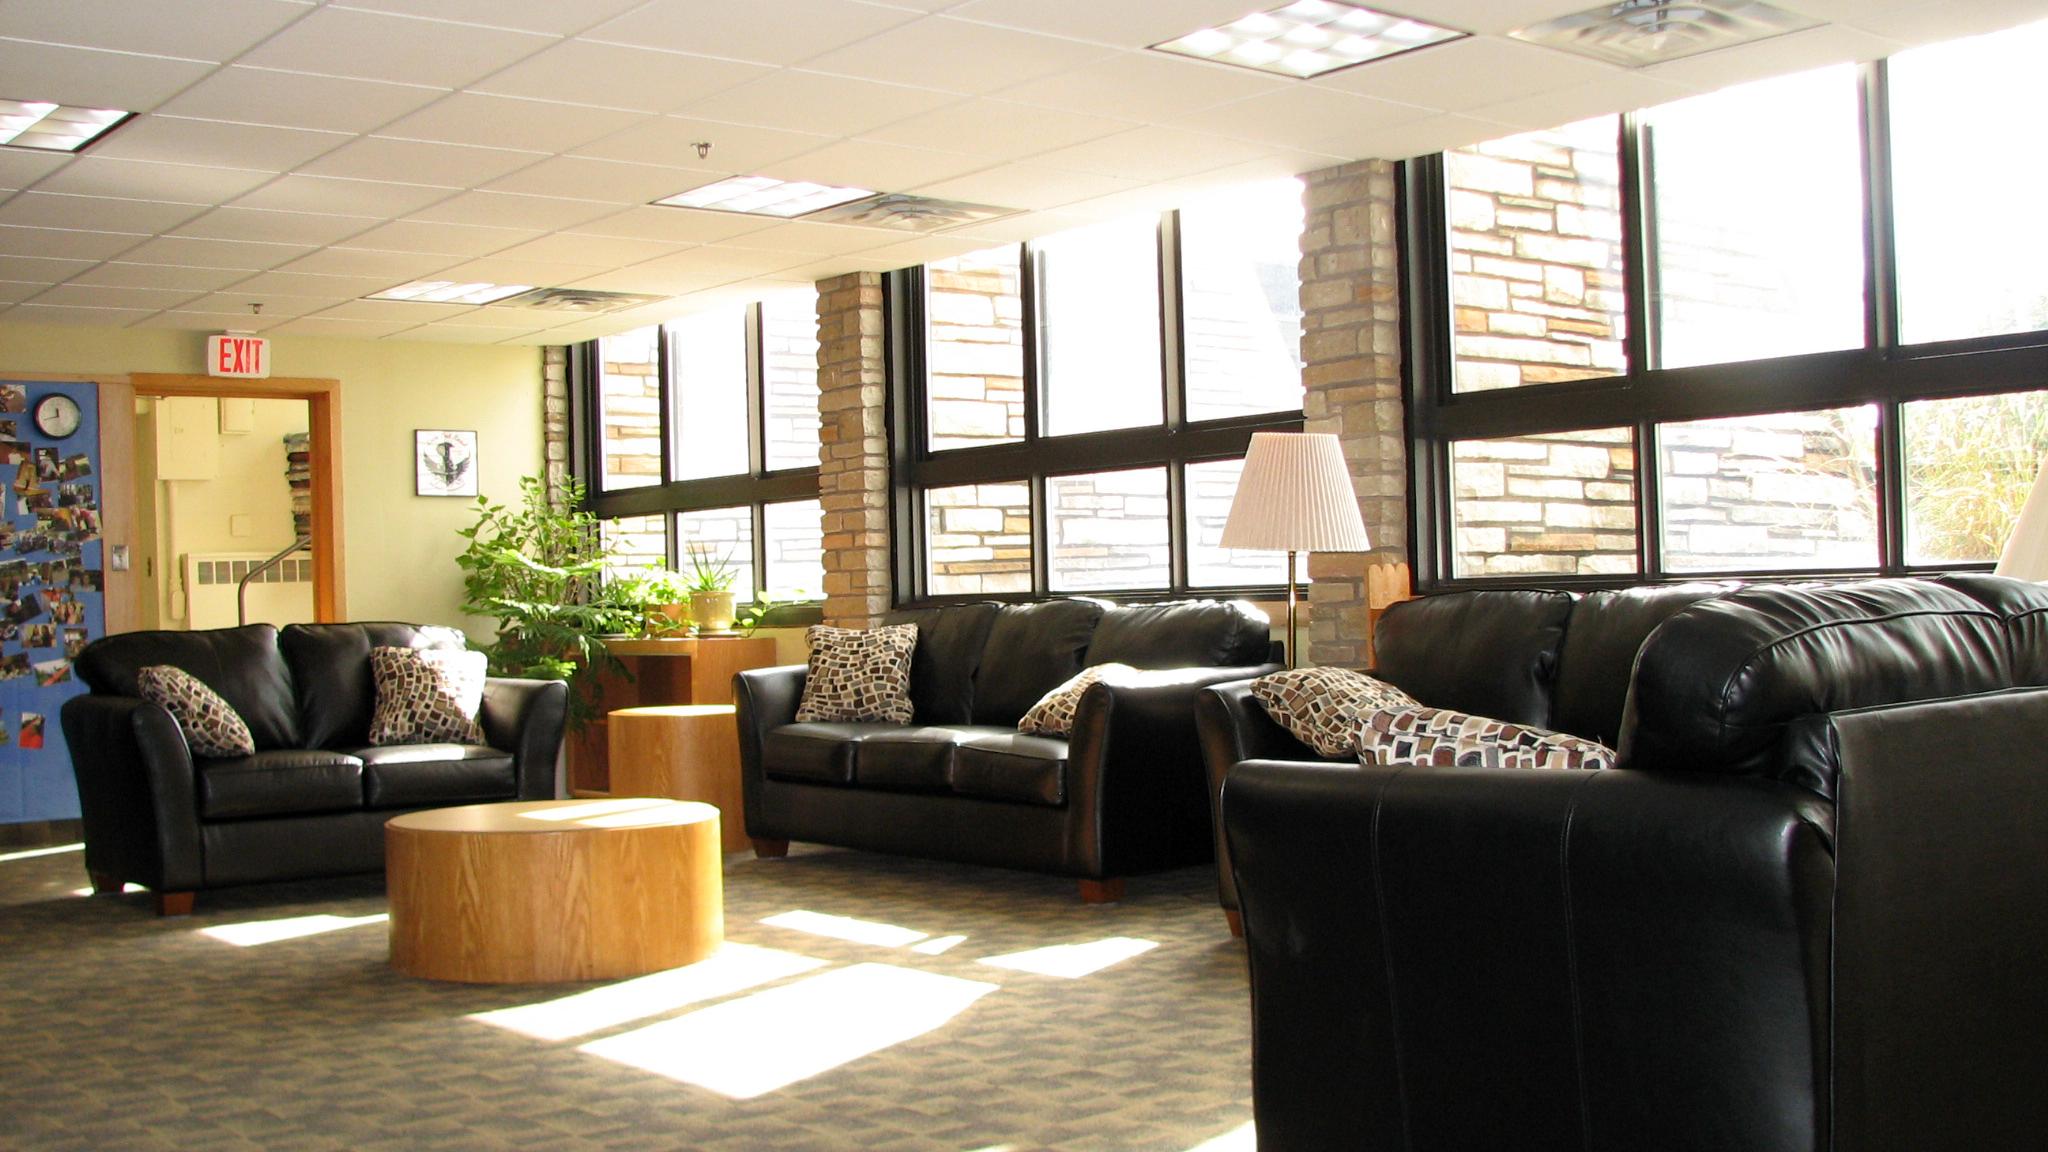 VCPC refurbished interior environment